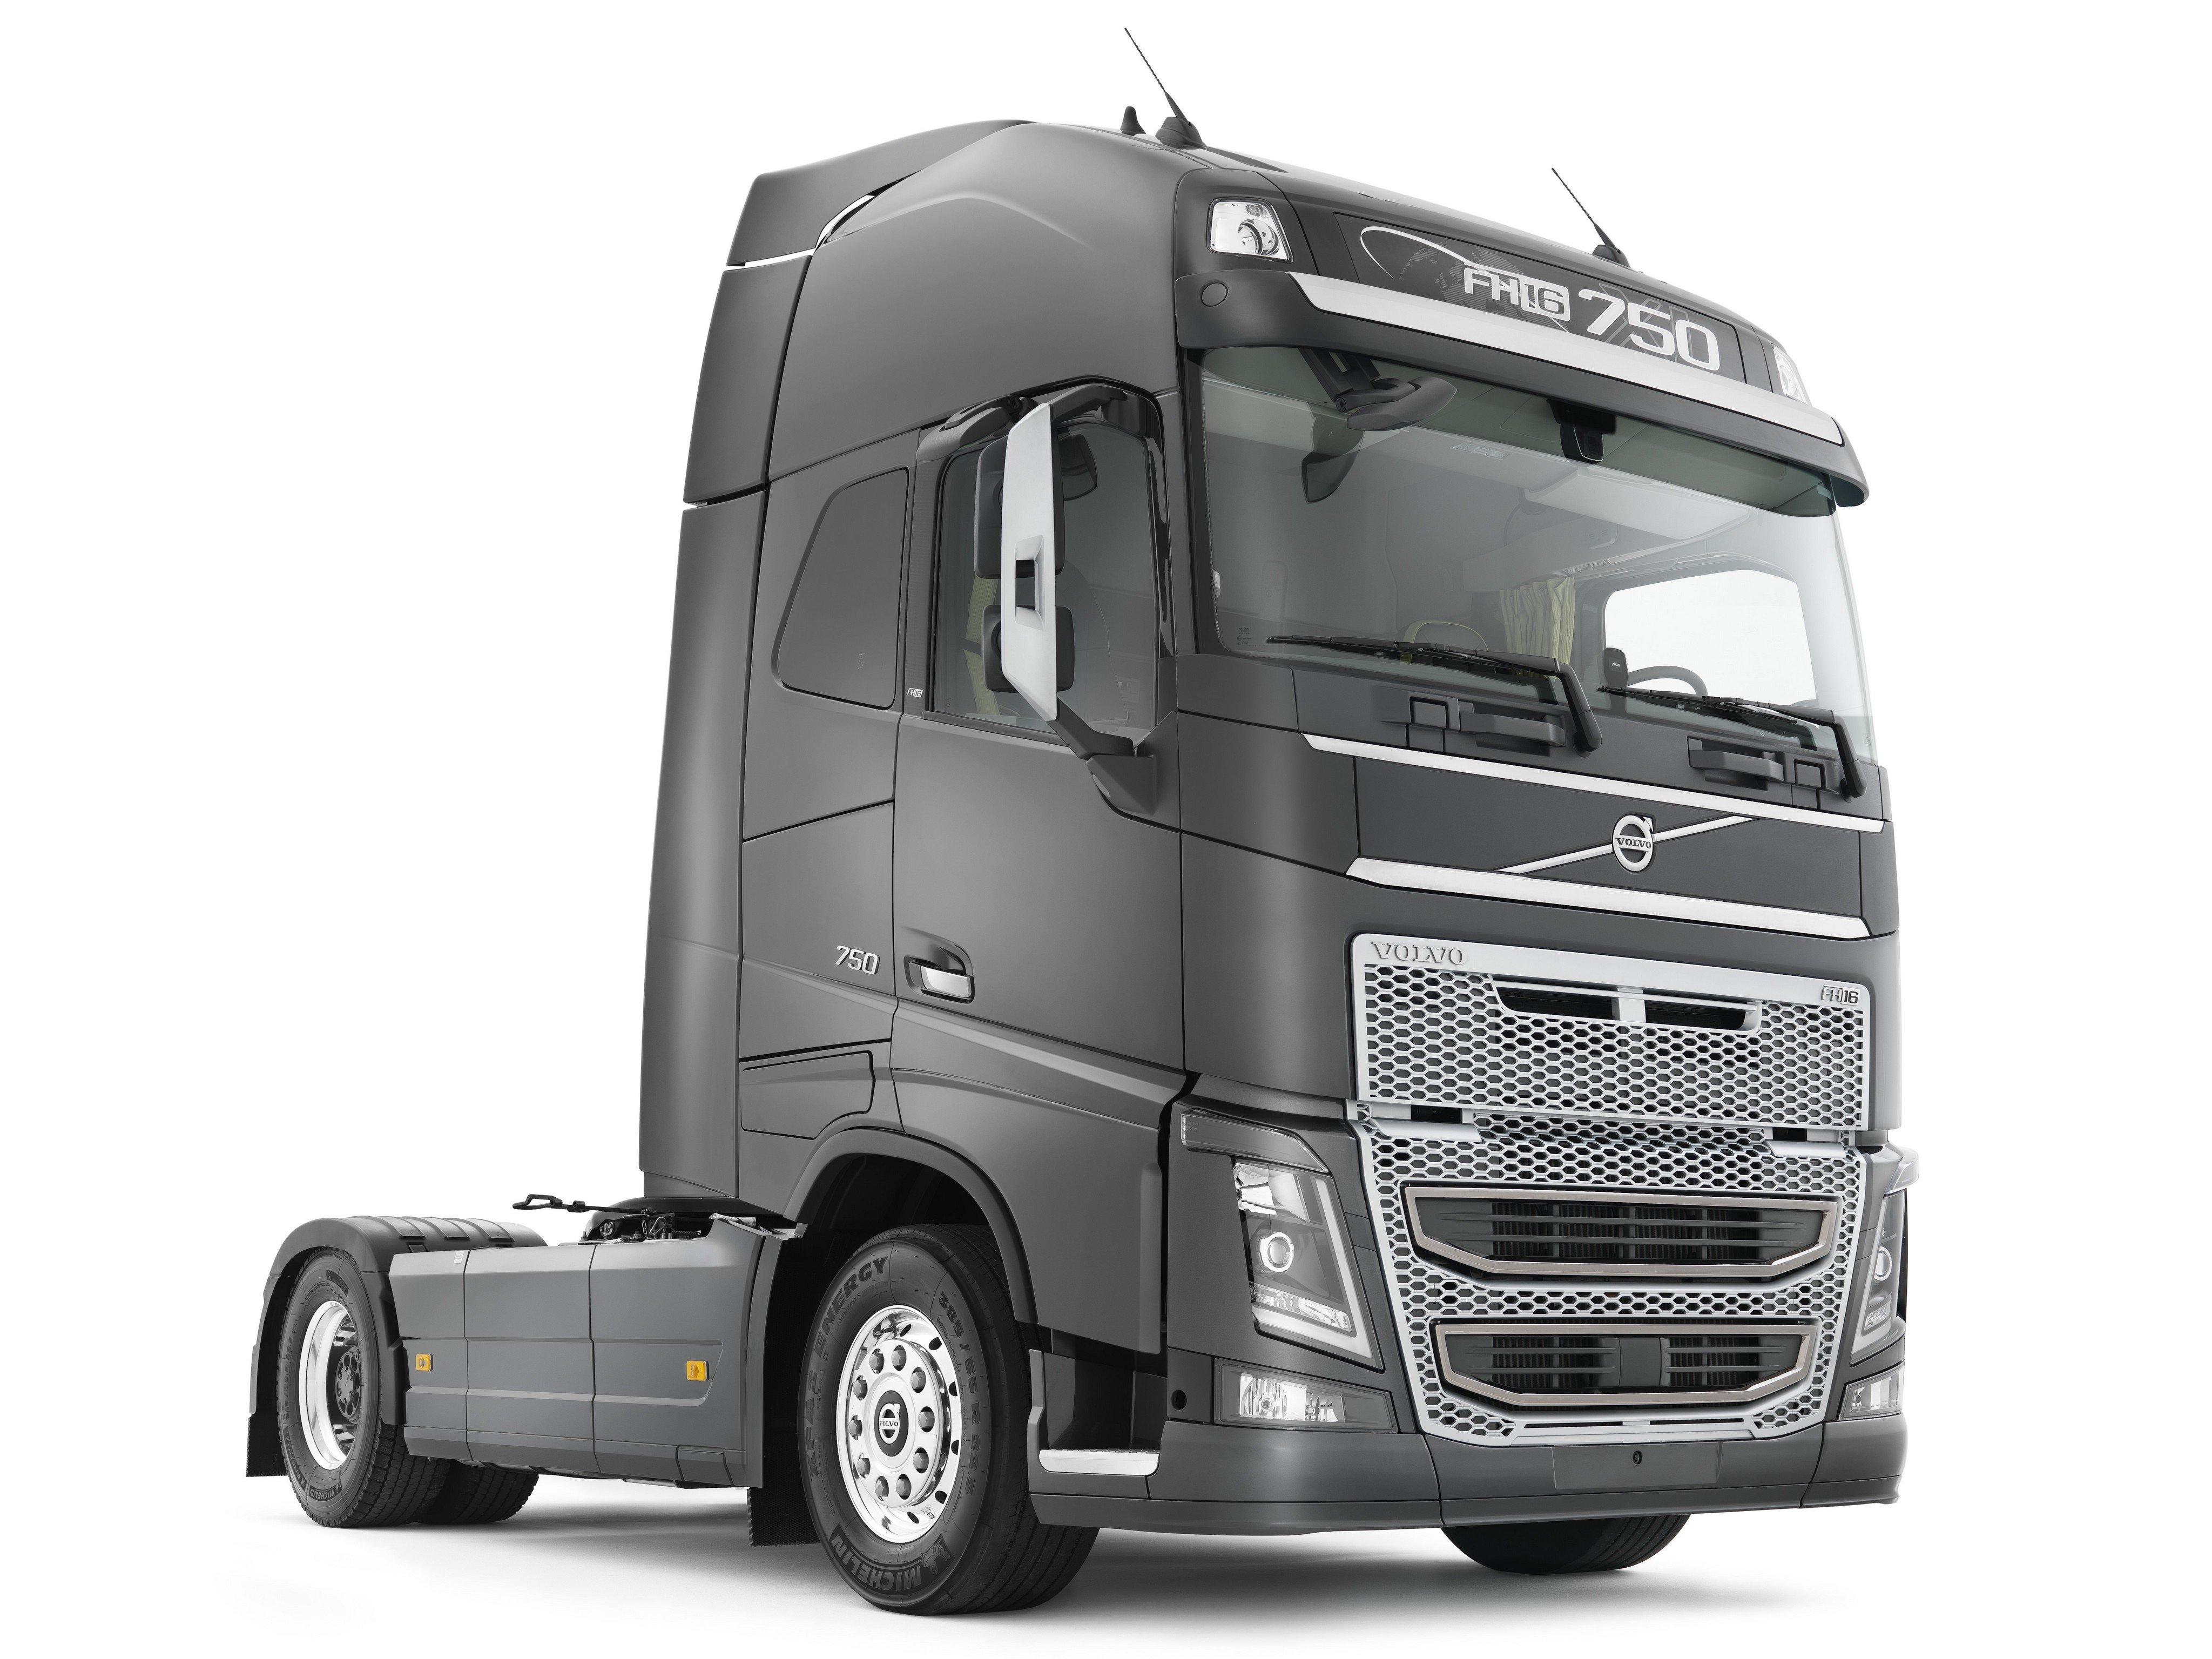 2012 volvo fh16 750 4x2 semi tractor wallpaper 4096x3072 538048 wallpaperup. Black Bedroom Furniture Sets. Home Design Ideas